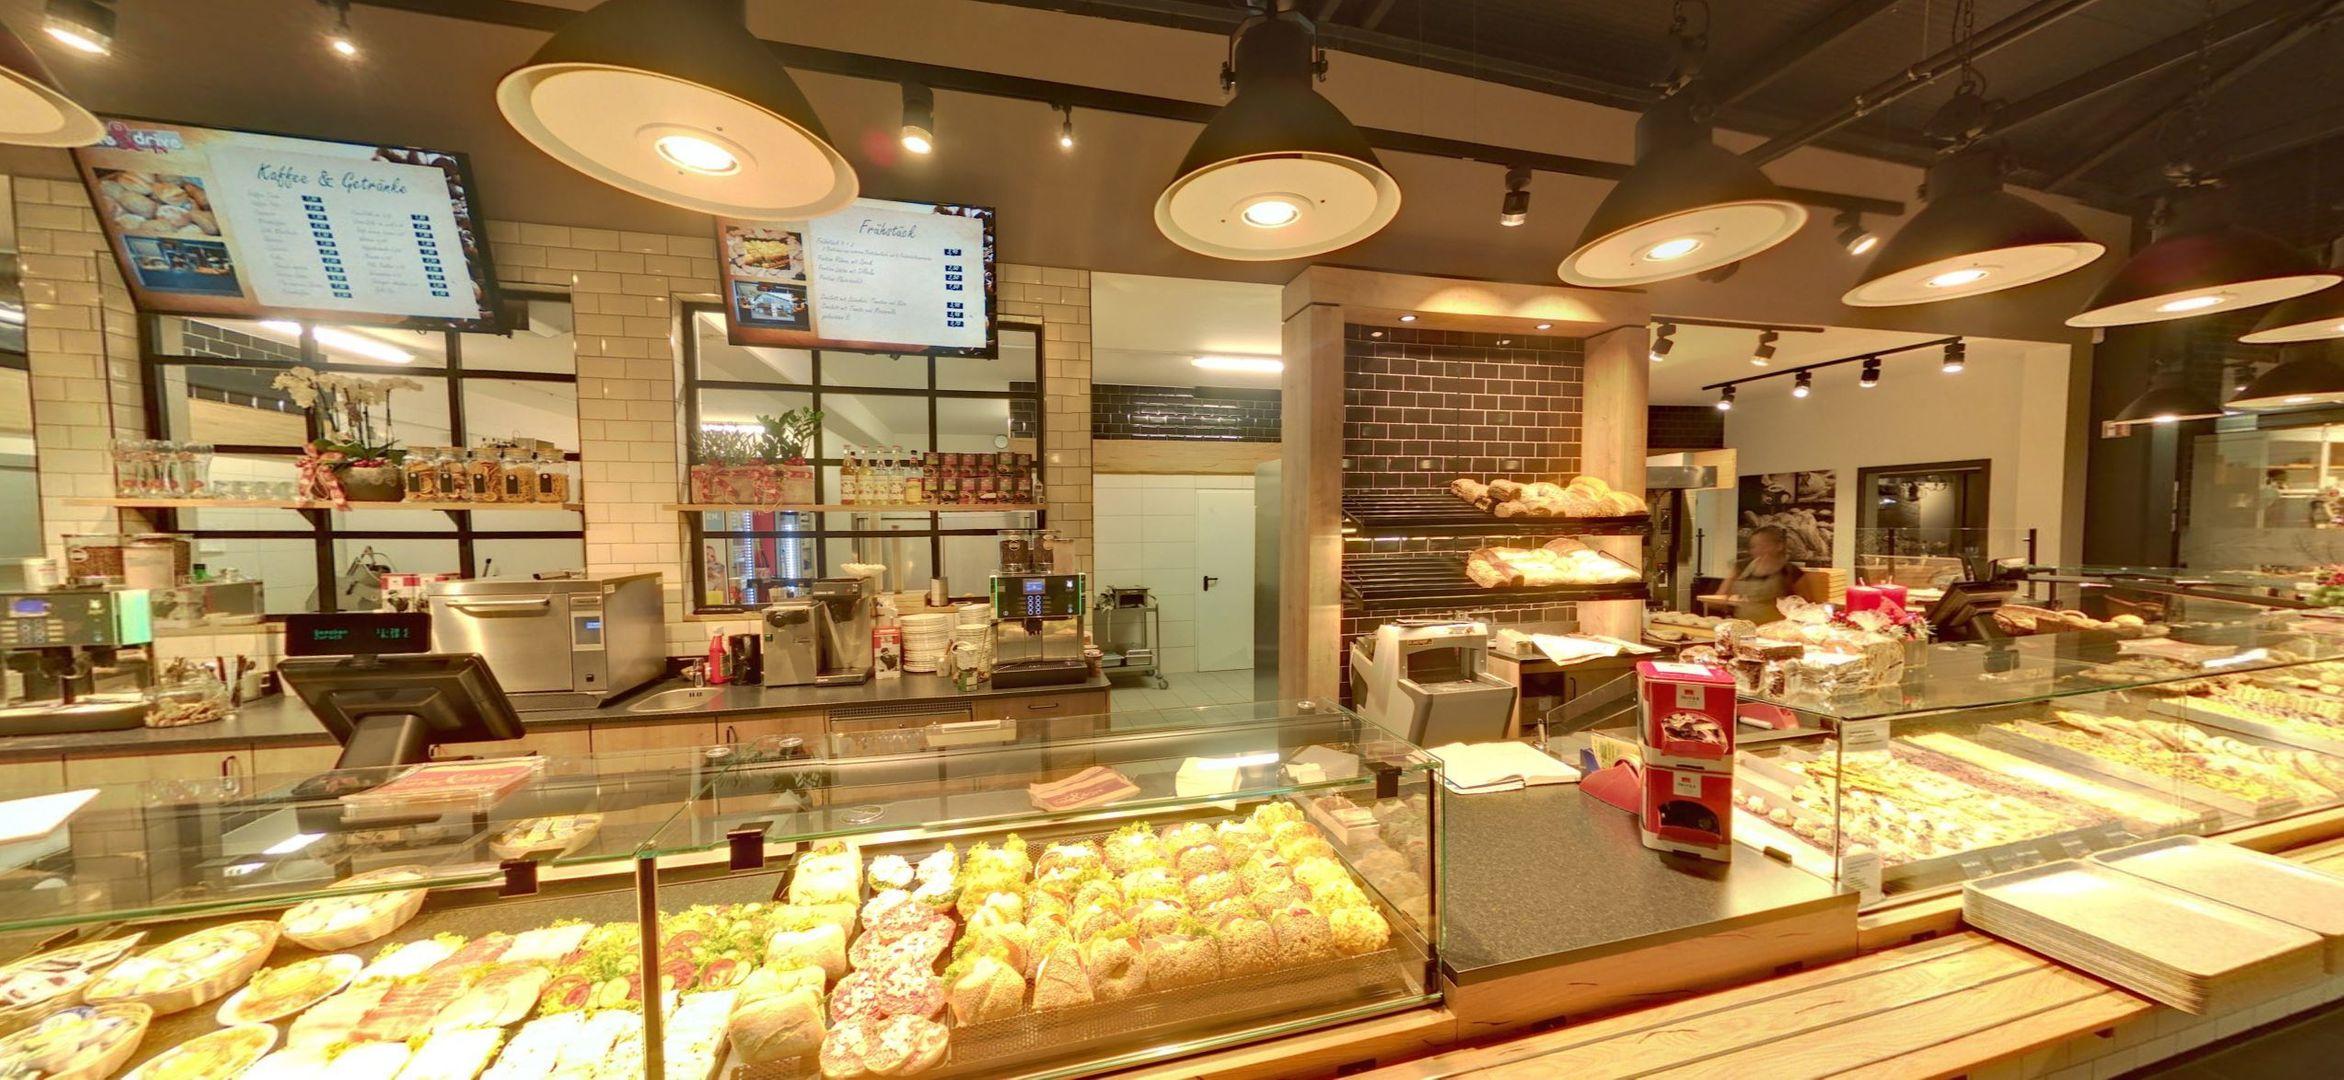 Herzlich Willkommen! | Café & Drive In